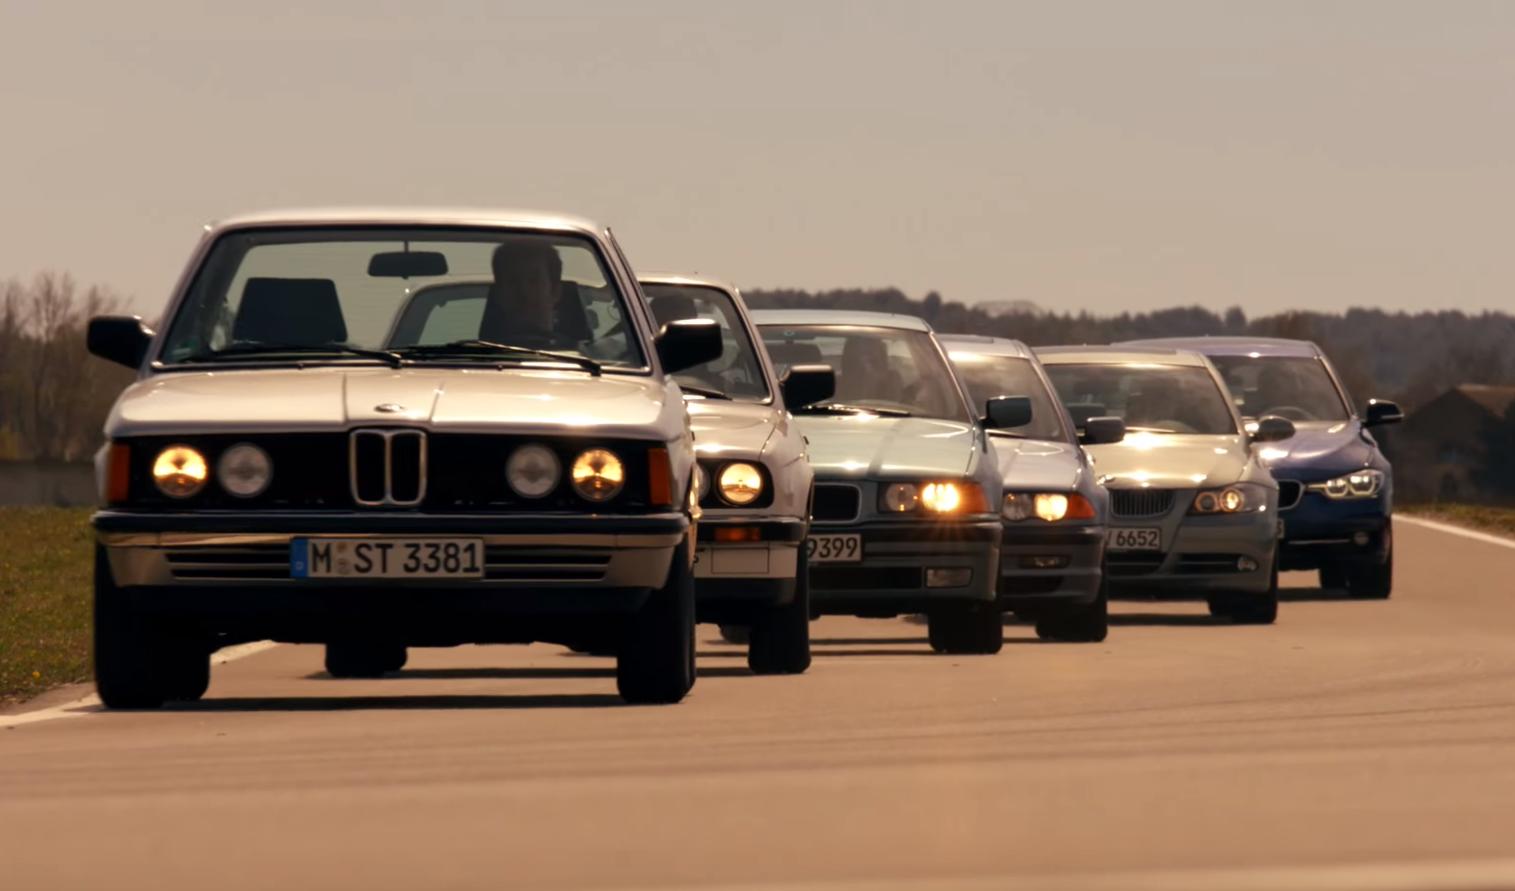 BMW 3 Series: Looking Forward, Glancing Back